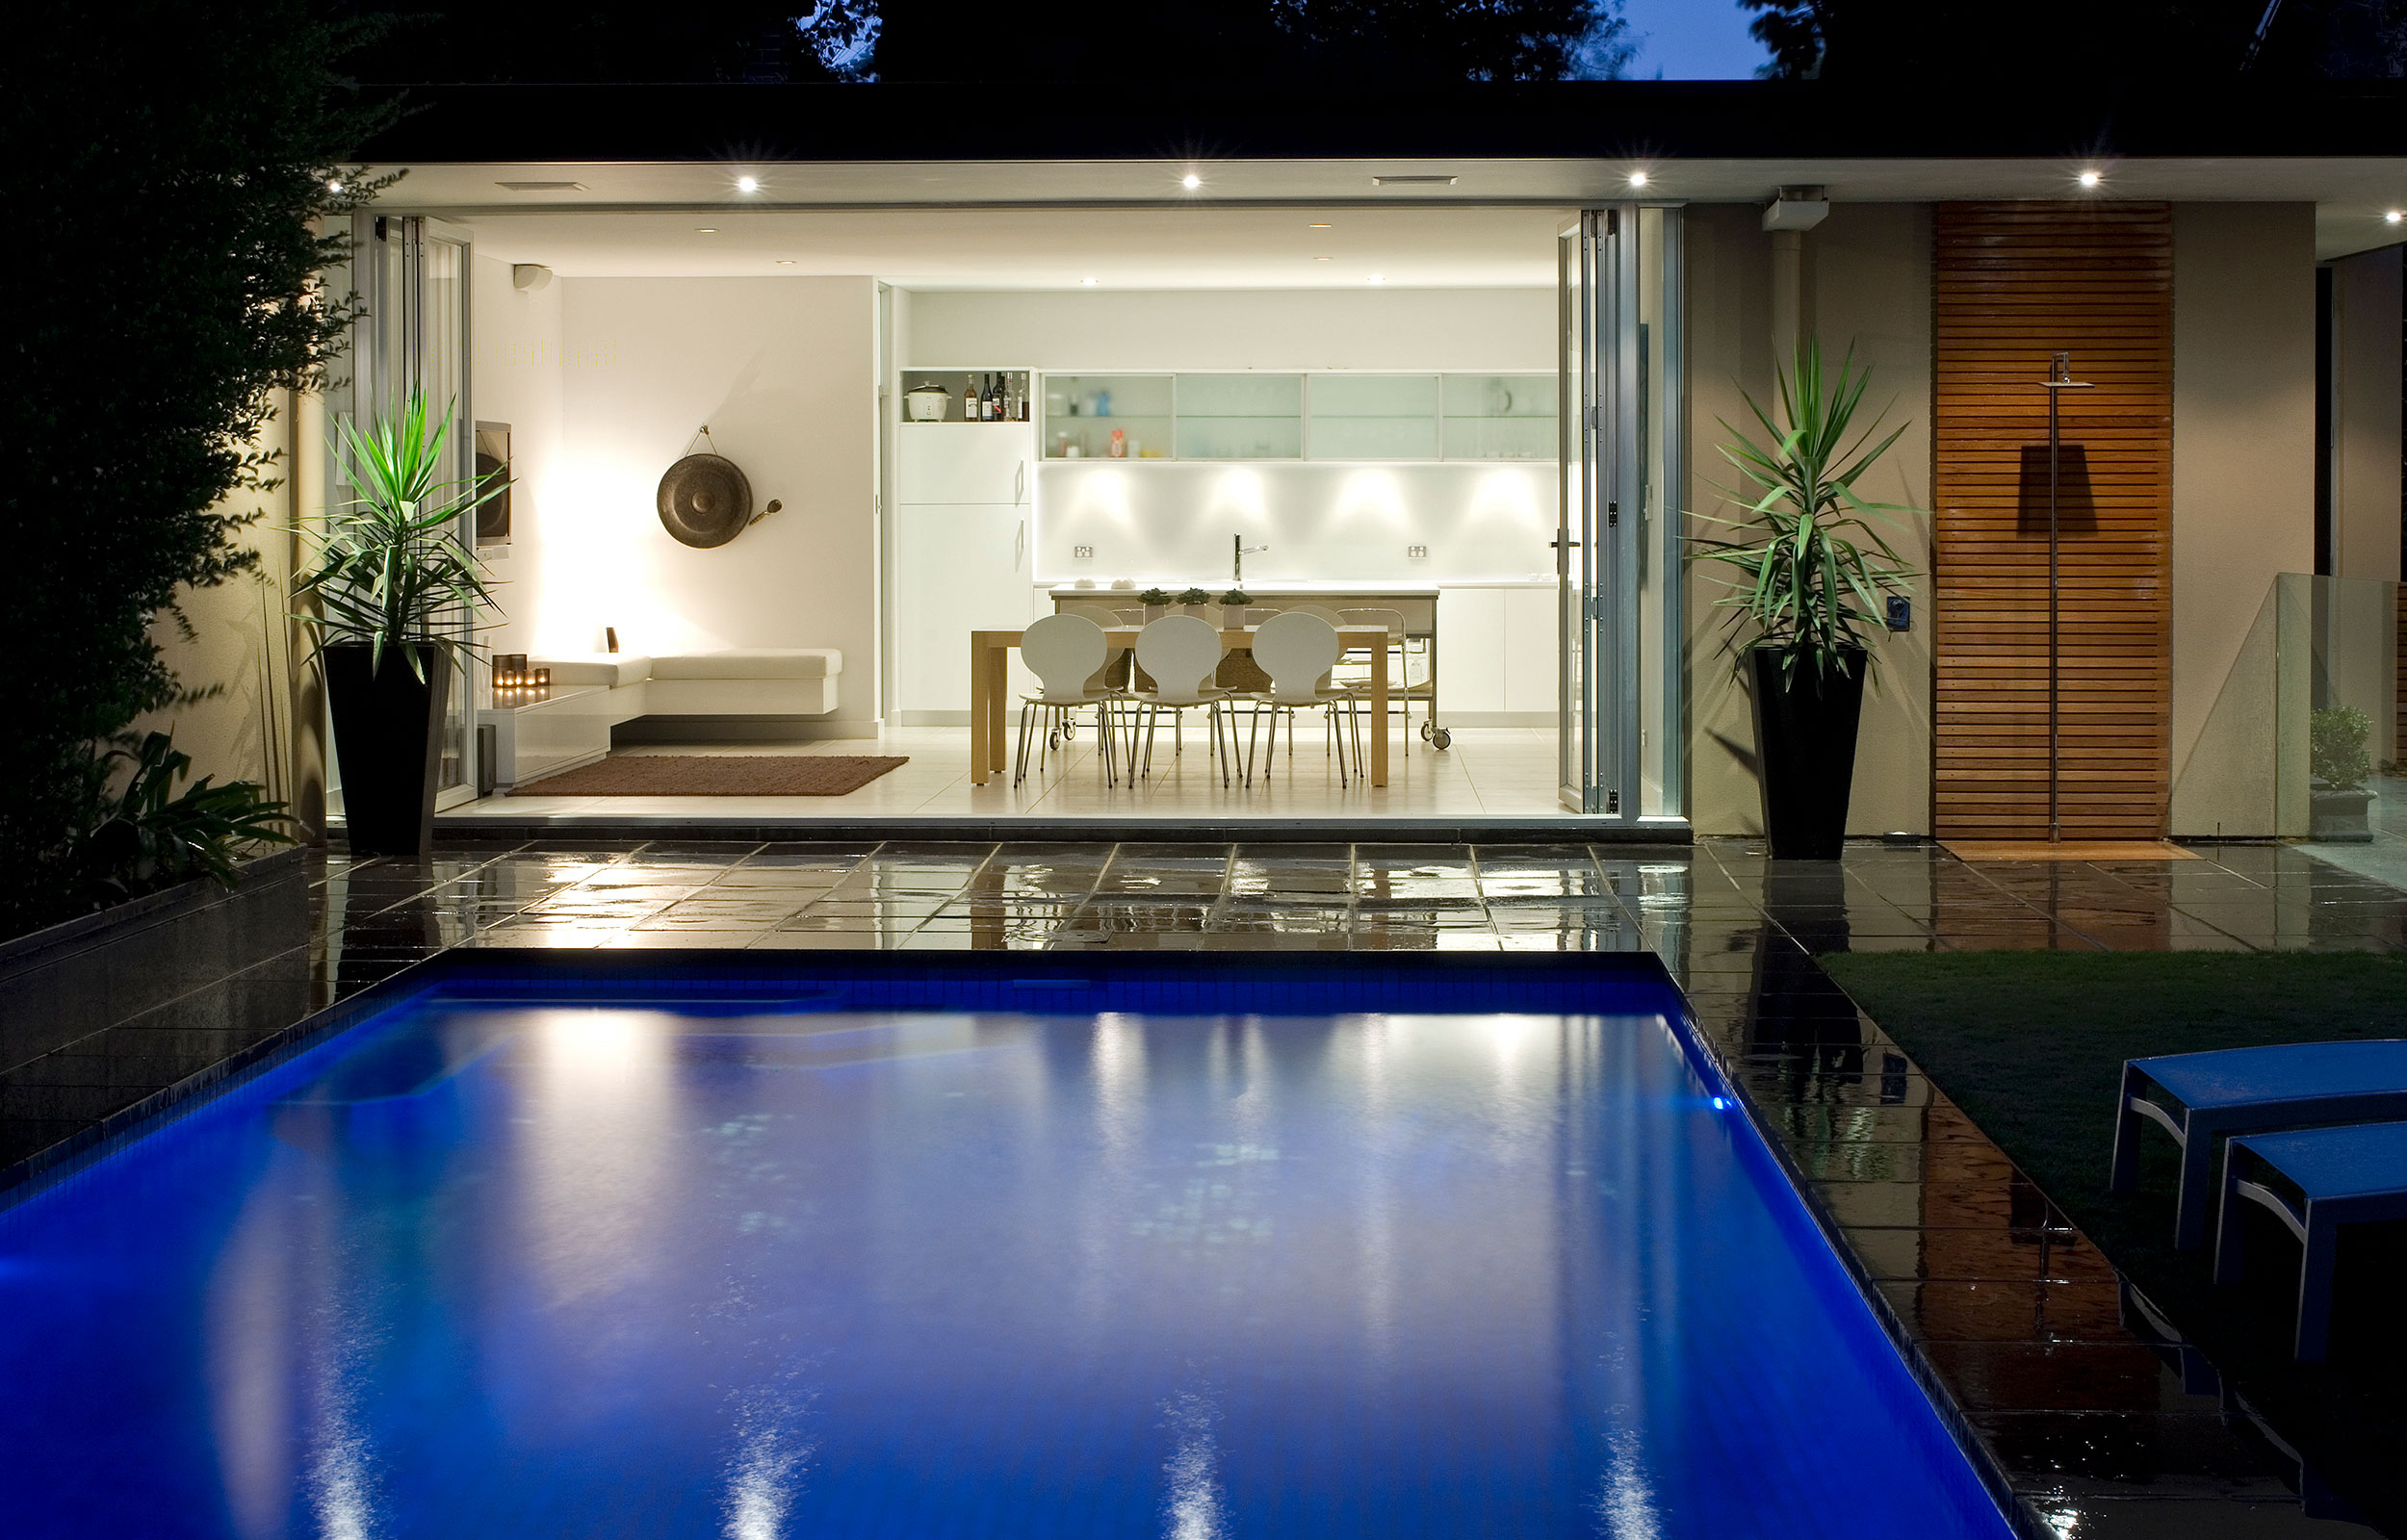 enoki-interior-Poolhouse-1.jpg